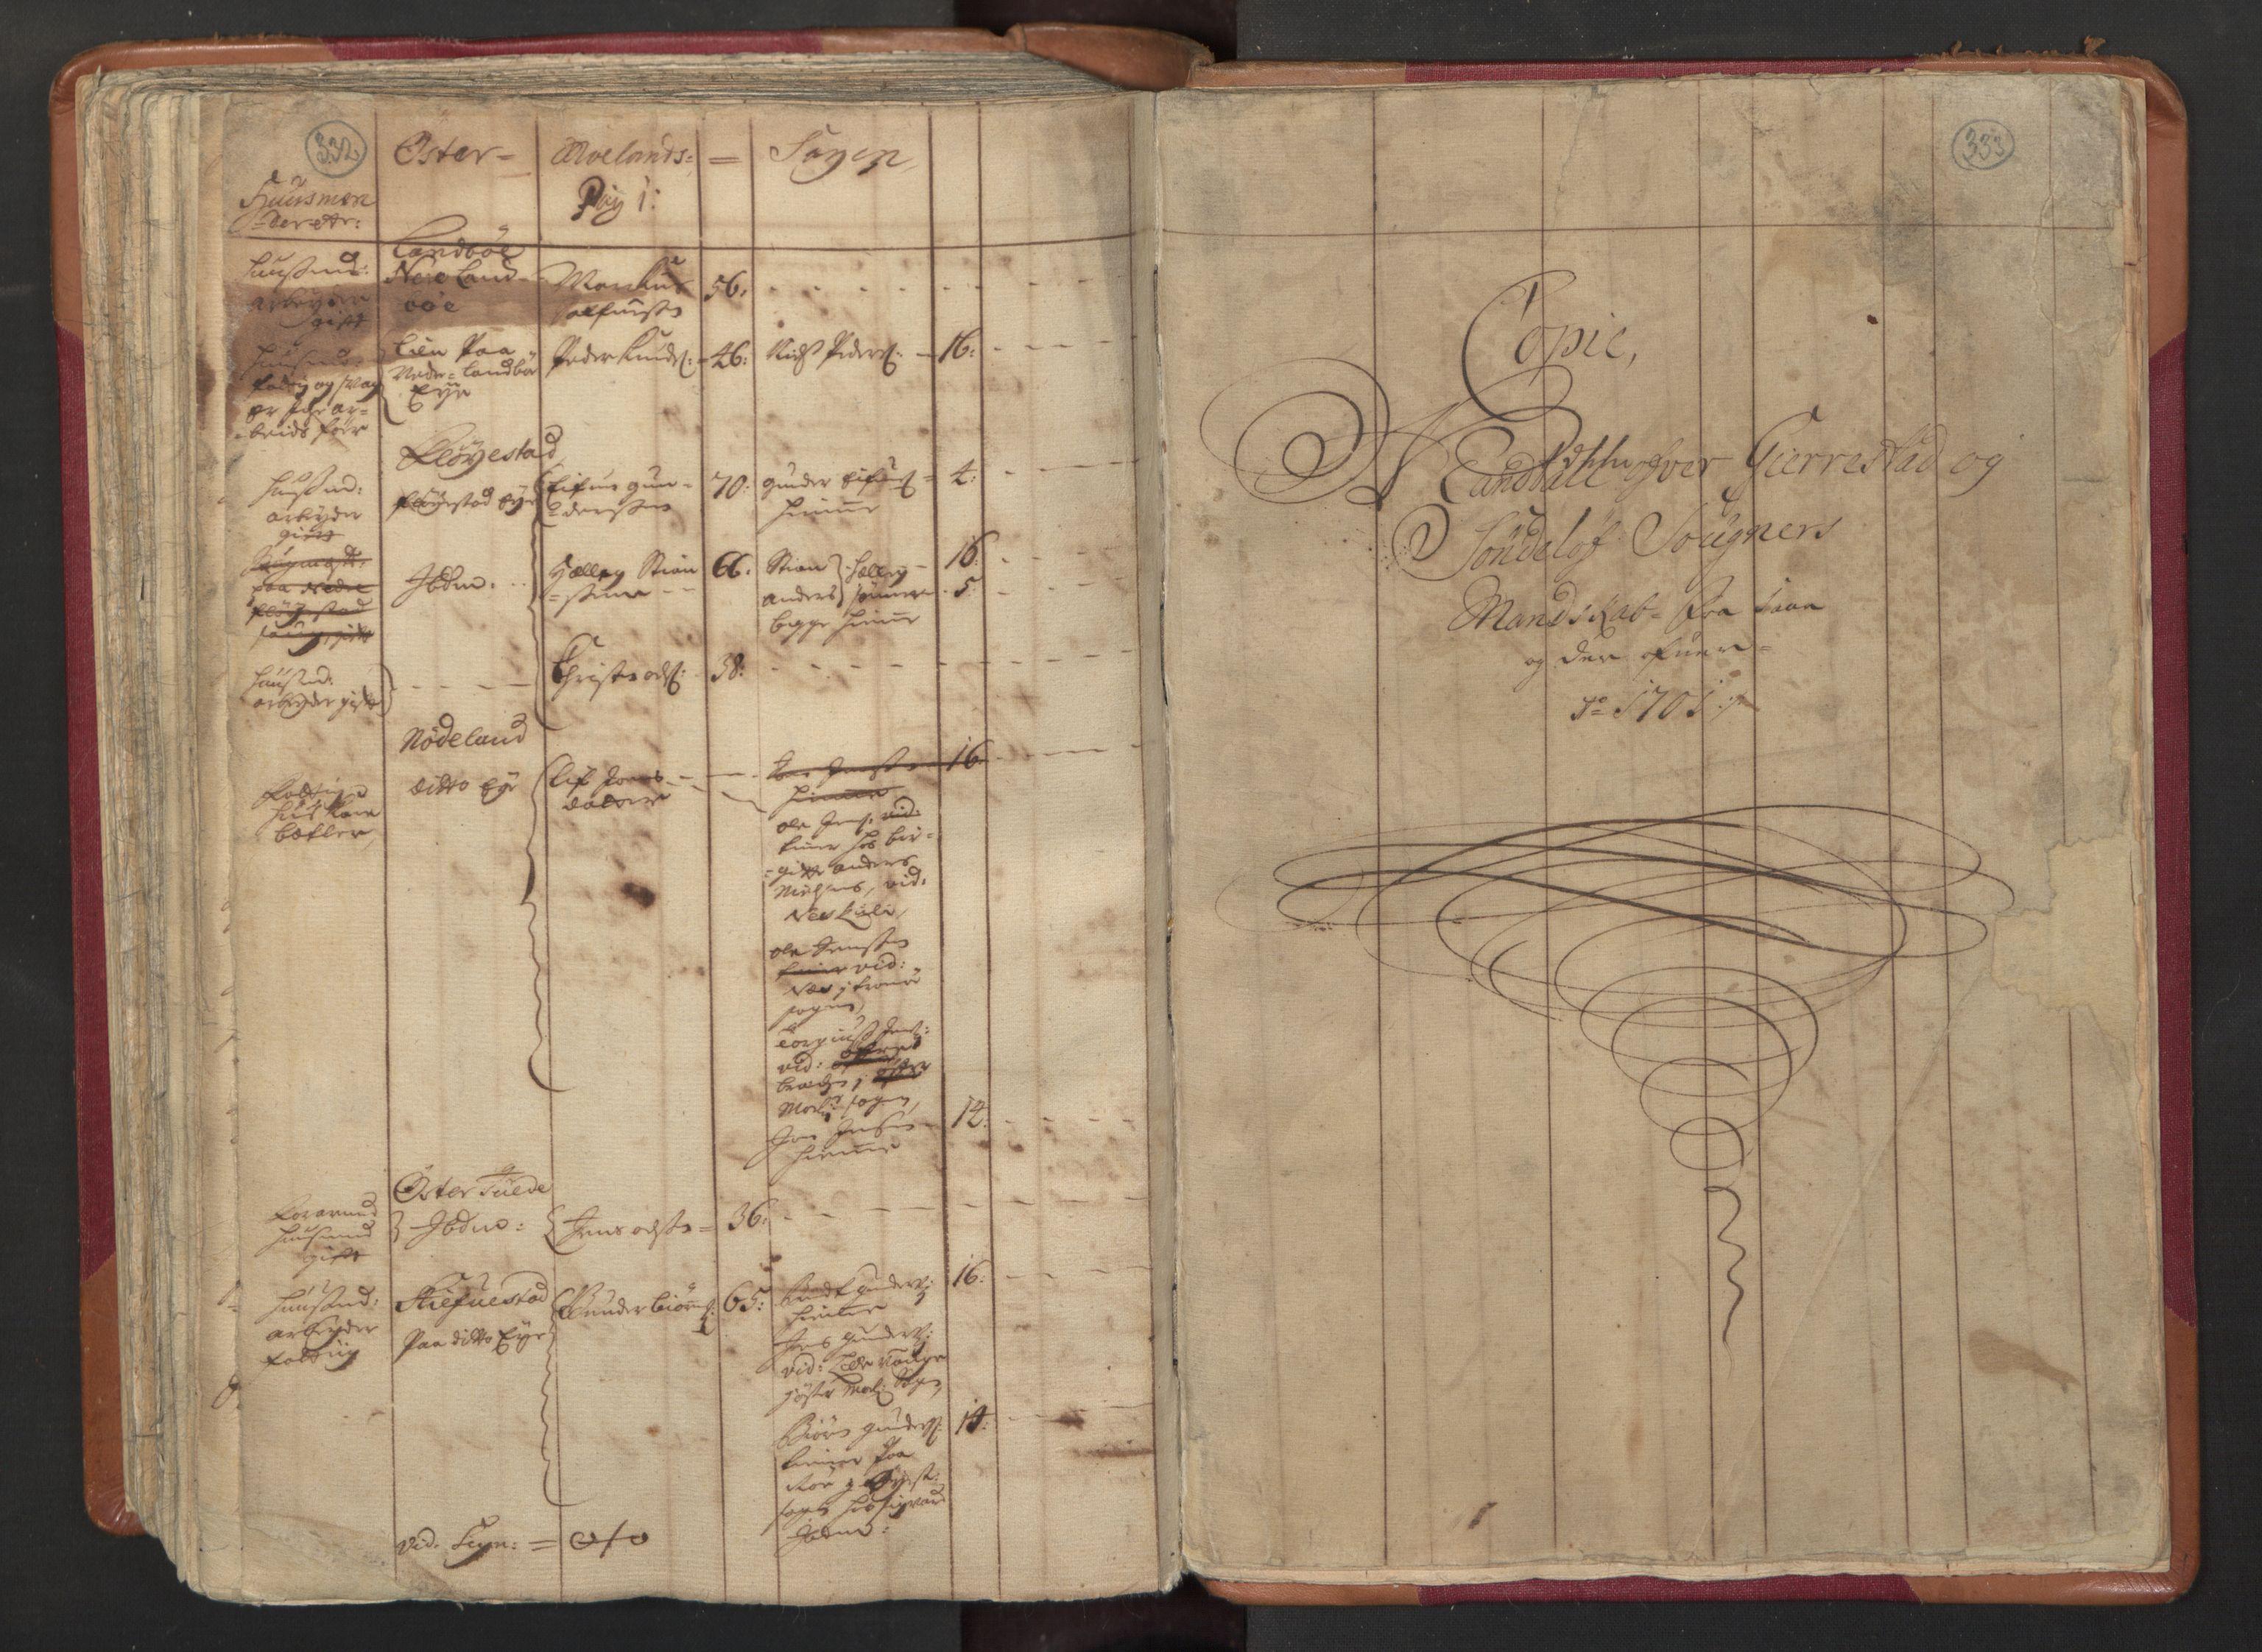 RA, Manntallet 1701, nr. 3: Nedenes fogderi, 1701, s. 332-333